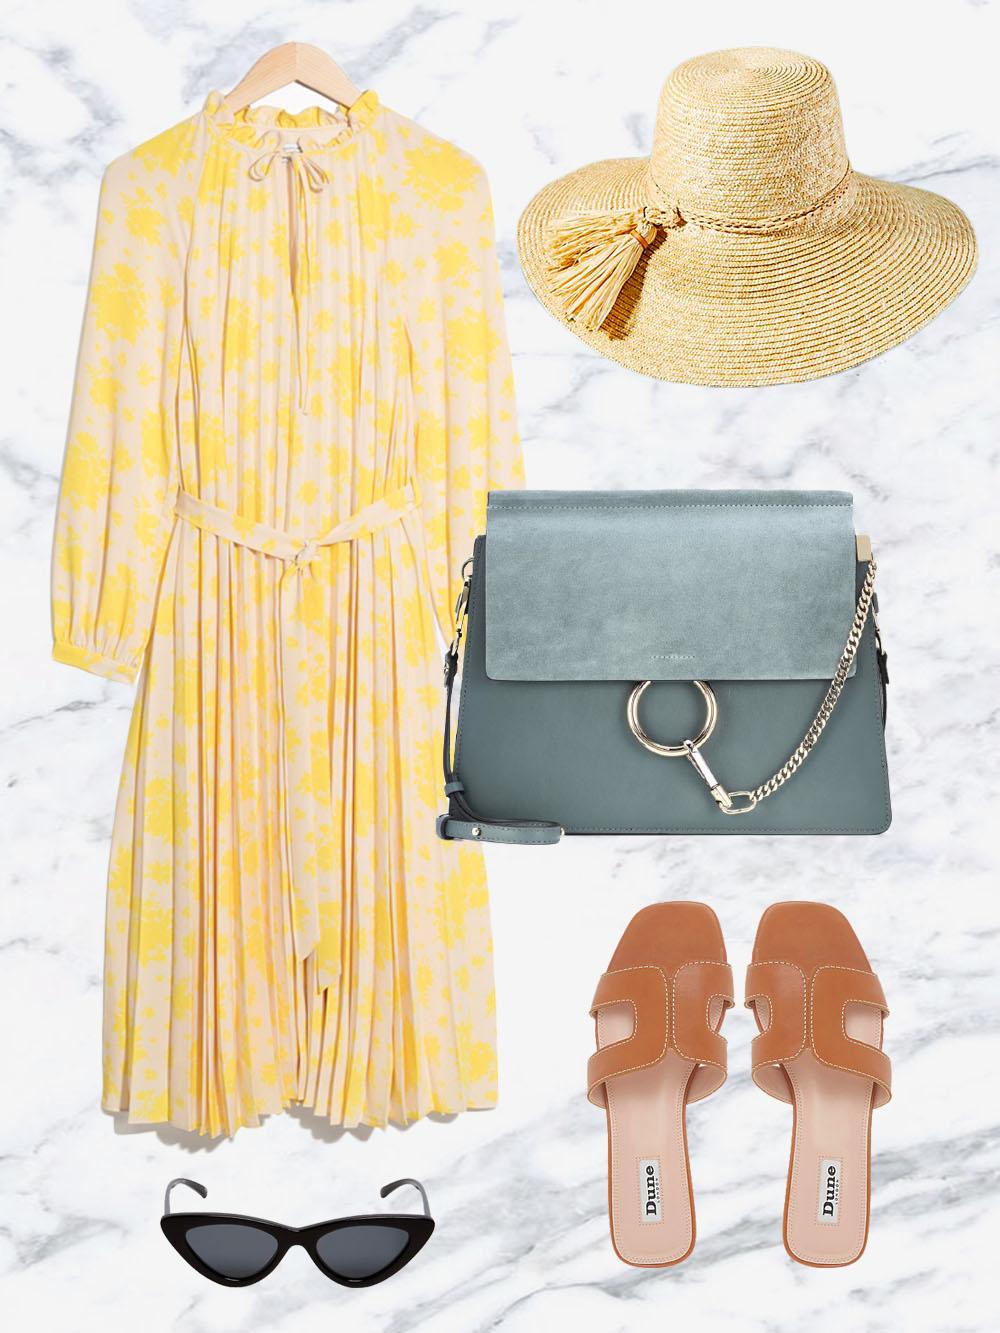 Chloe Faye Bag Outfit Ideas